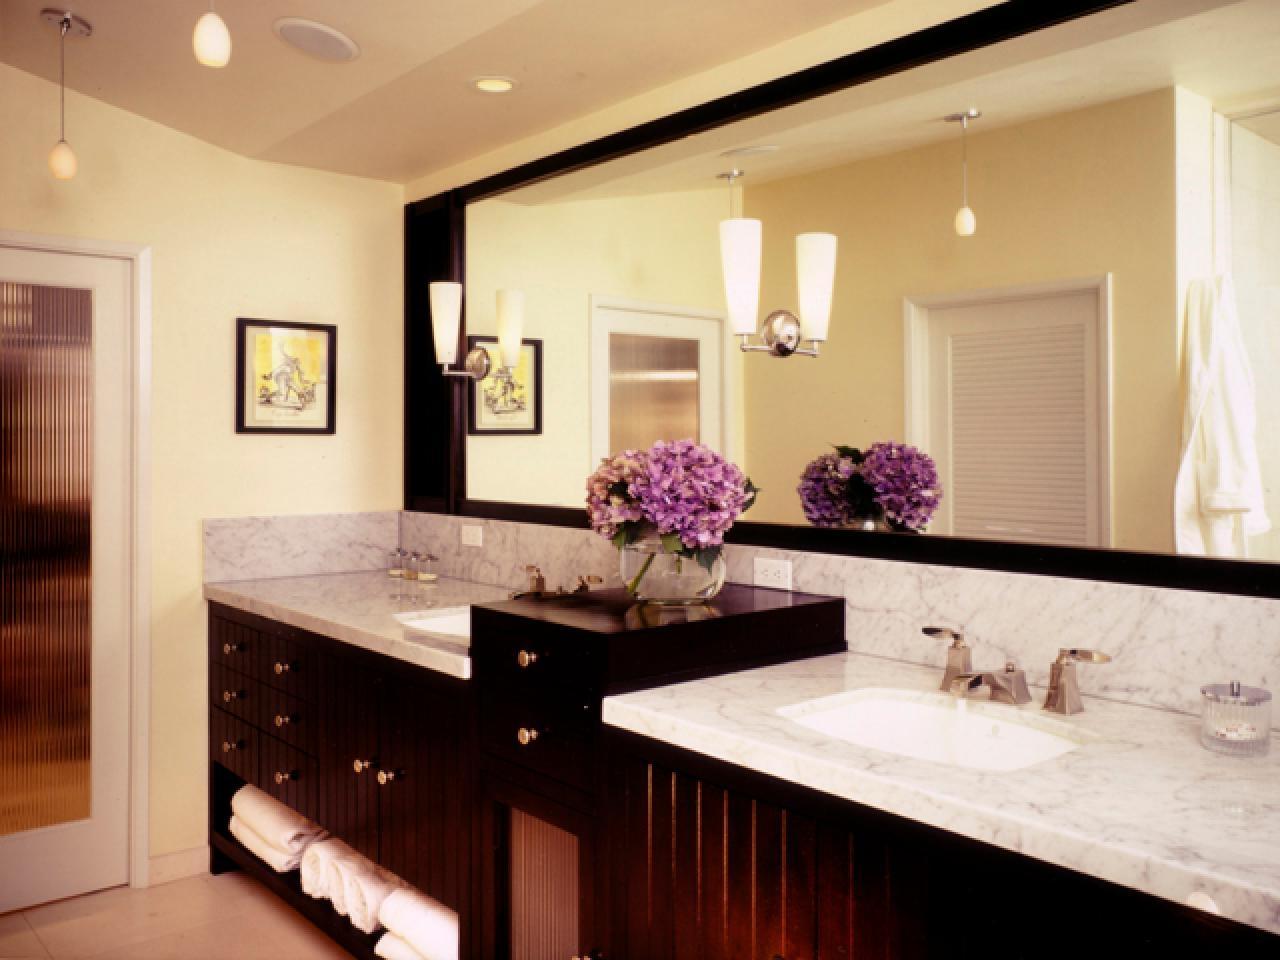 Designing Bathroom Lighting Hgtv Regarding Bathroom Lighting Chandeliers (Image 16 of 25)